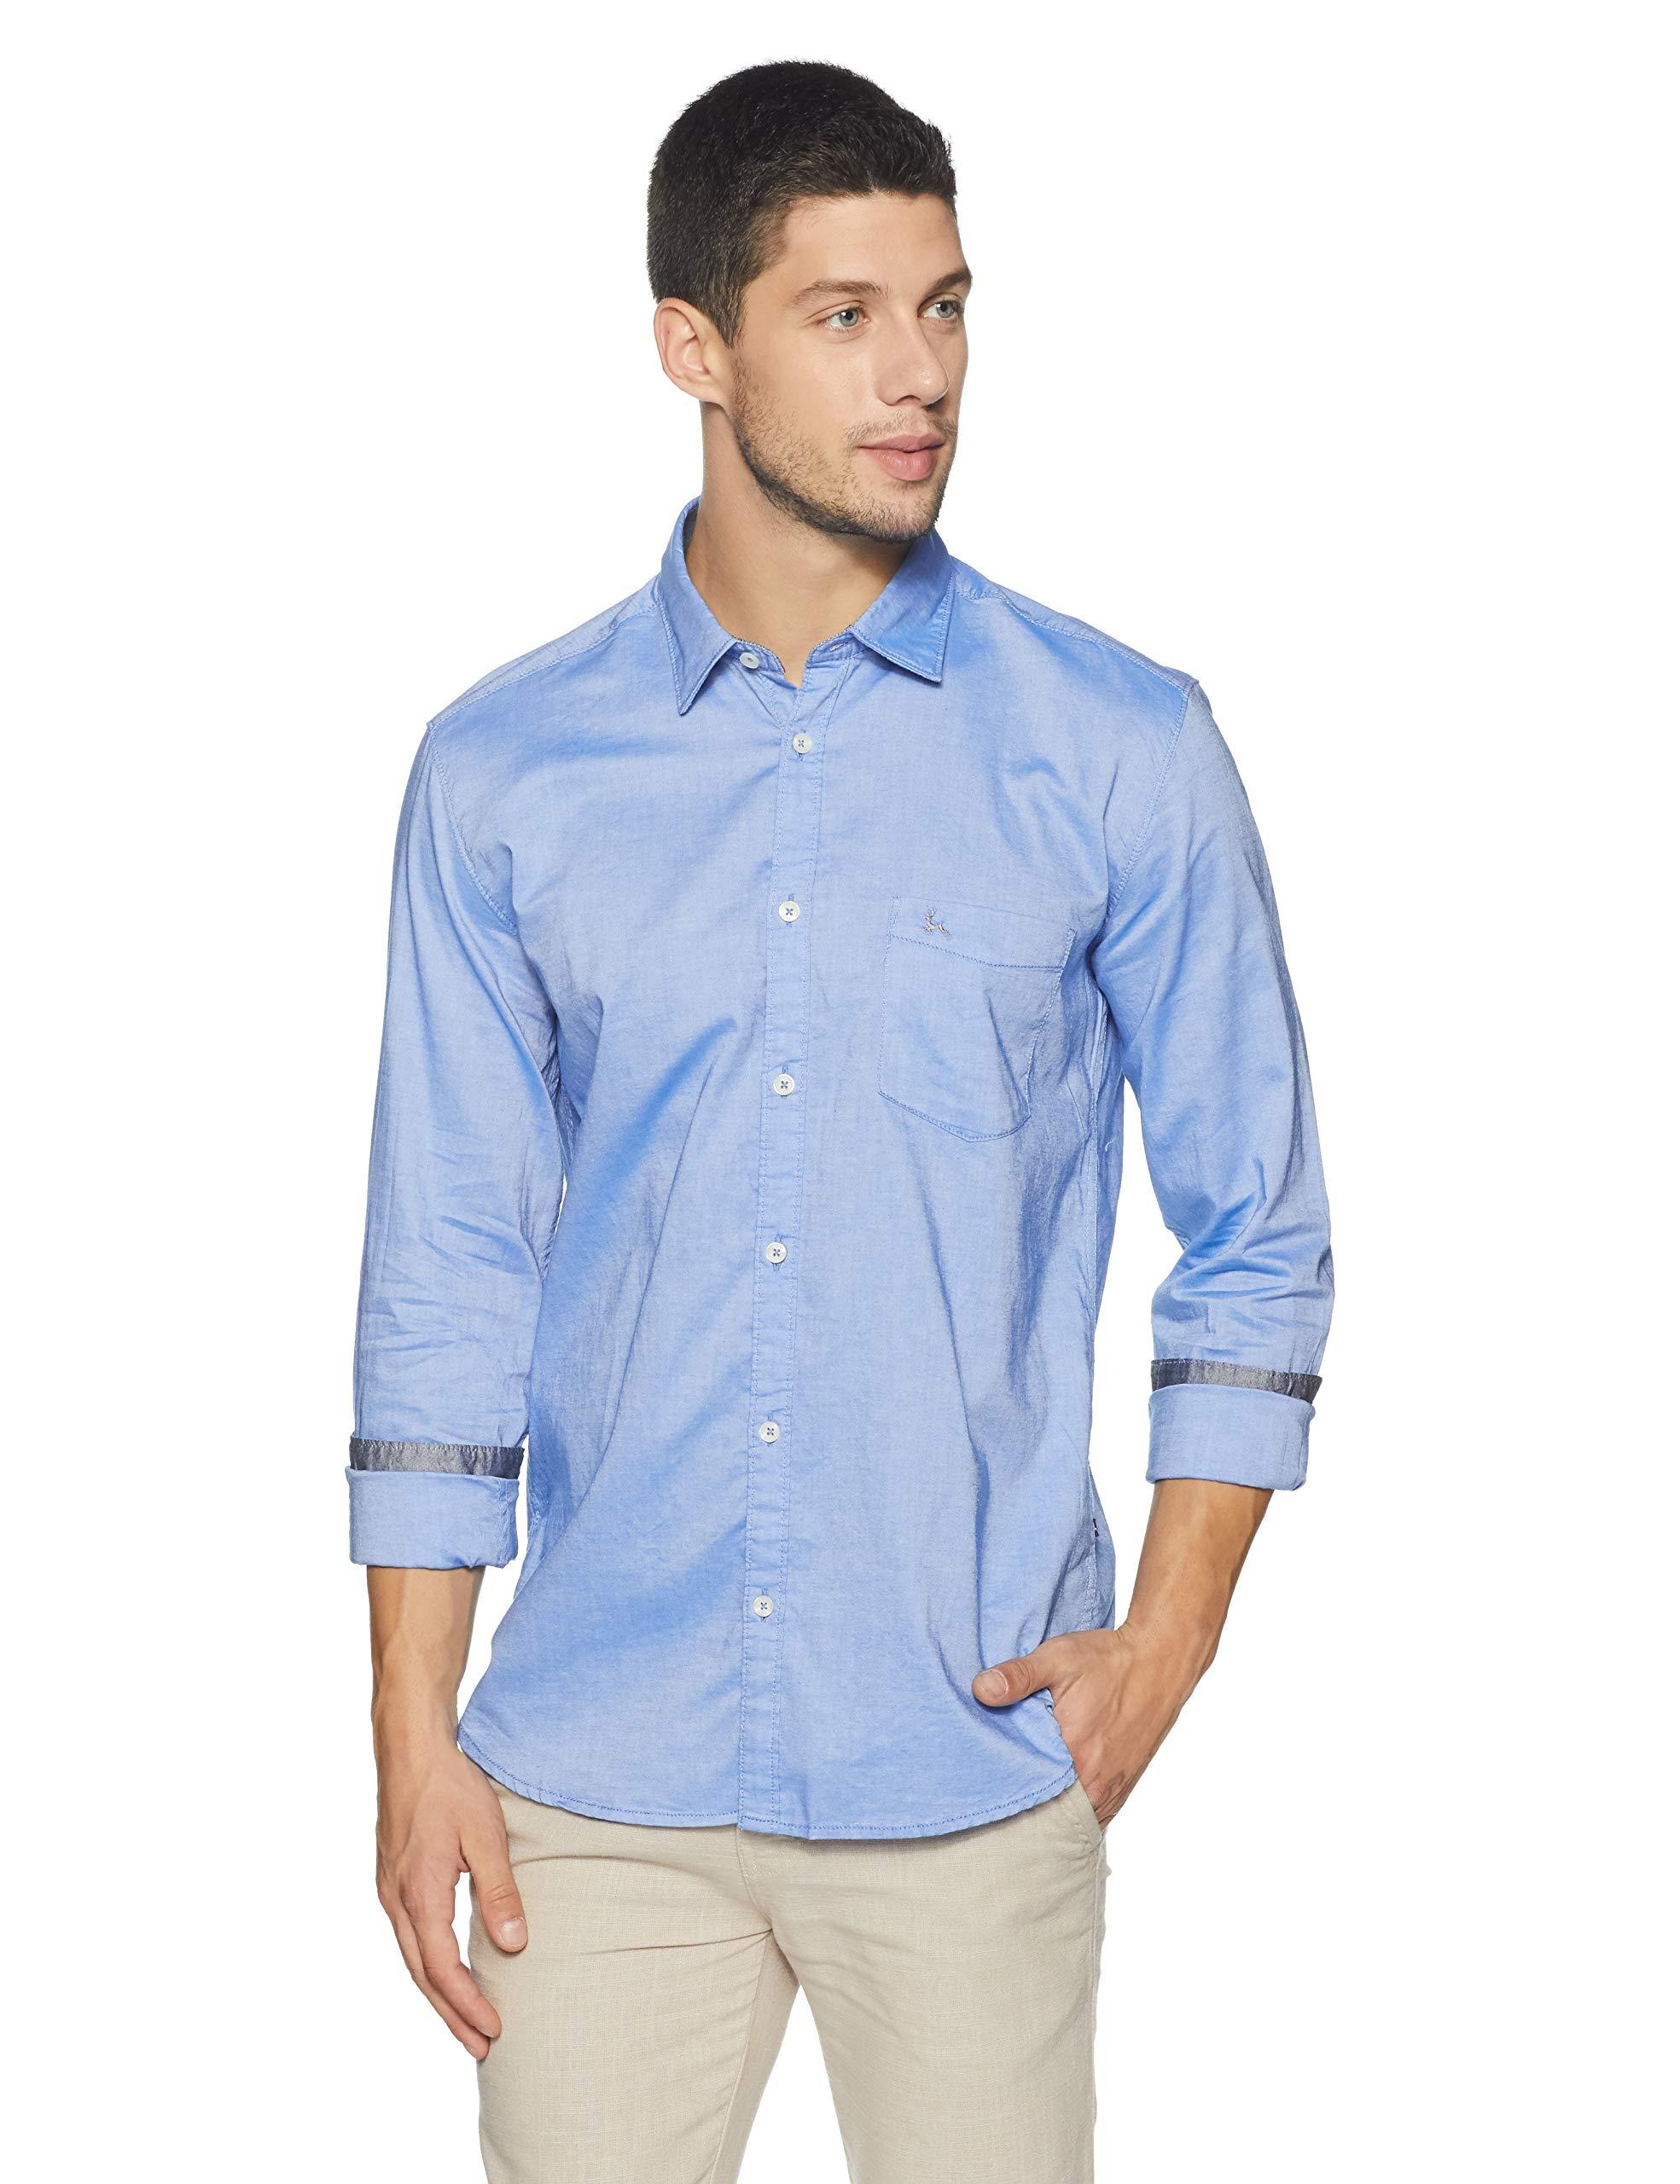 parx clothing apparel ltd